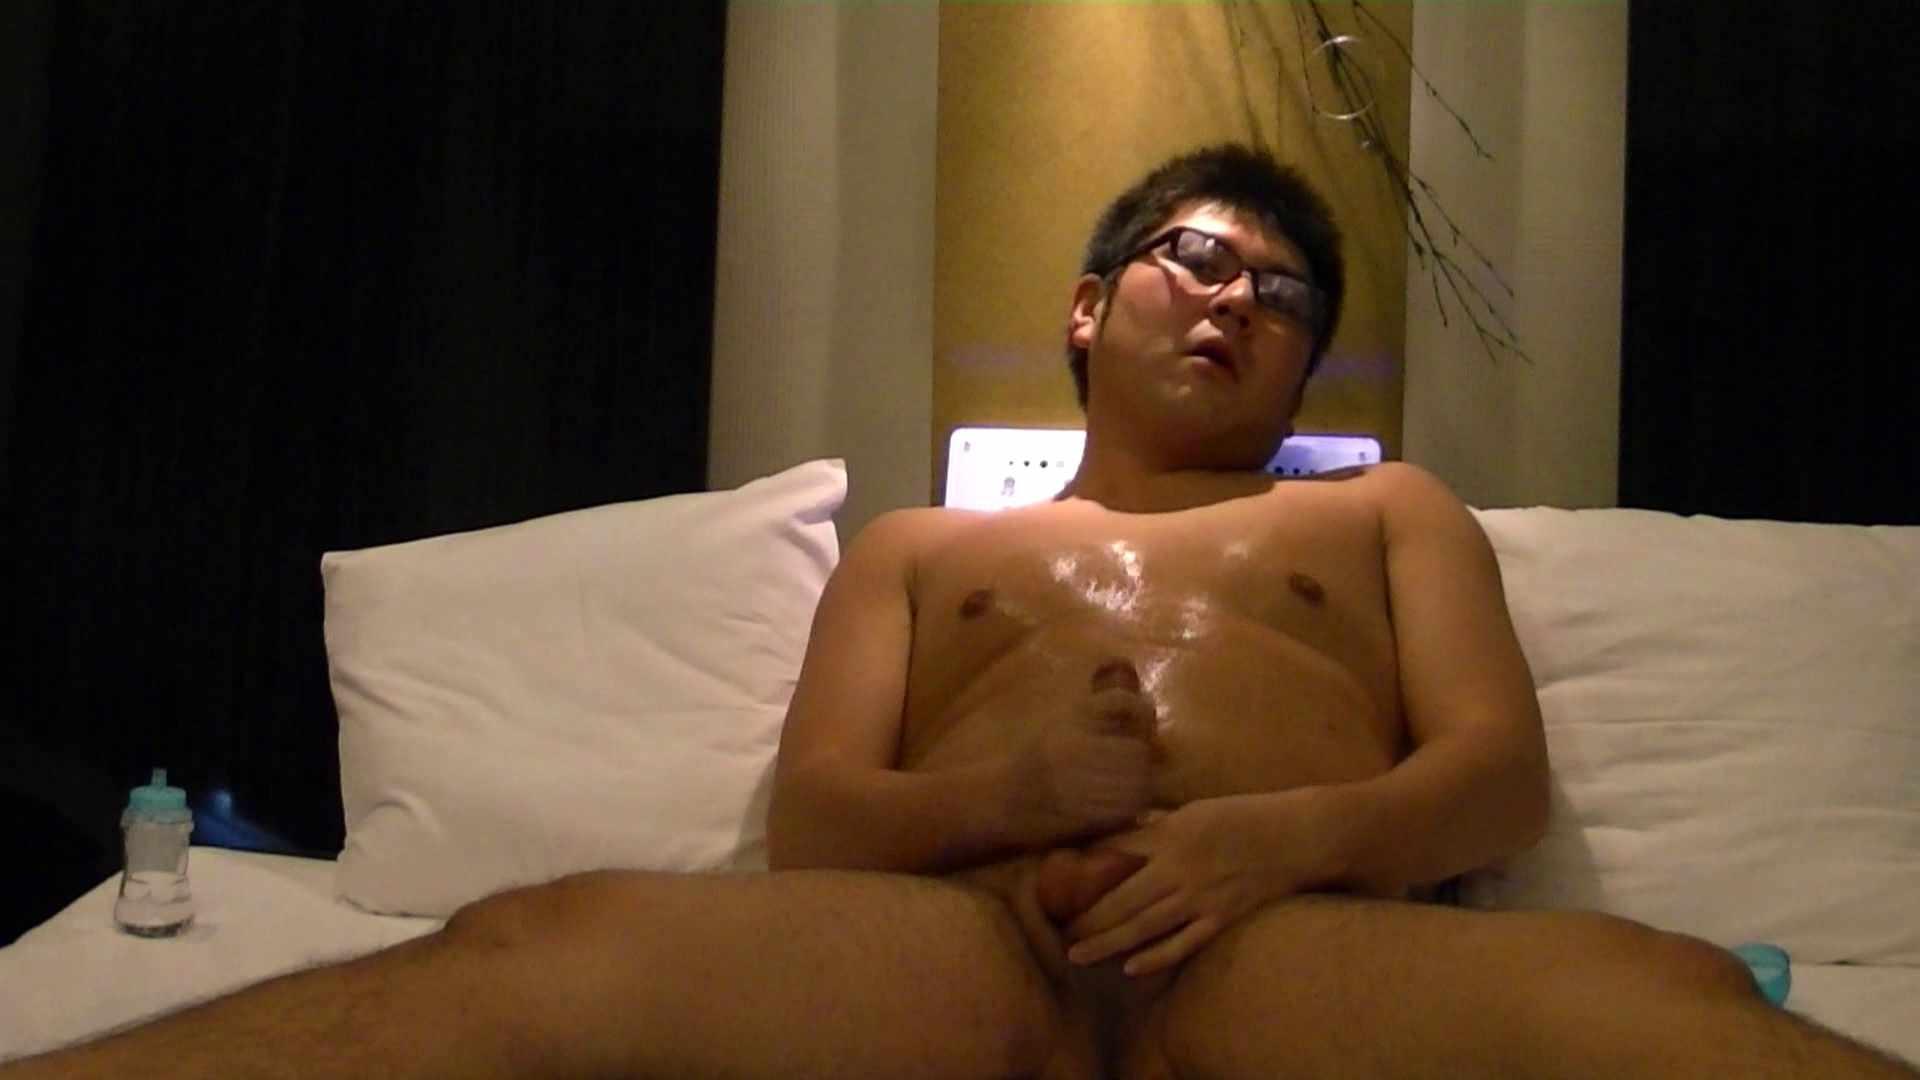 Mr.オナックスさん投稿!HD 貴方のオナニー三万円で撮影させてください。VOL.03 後編 完全無修正でお届け | オナニー特集  83pic 22